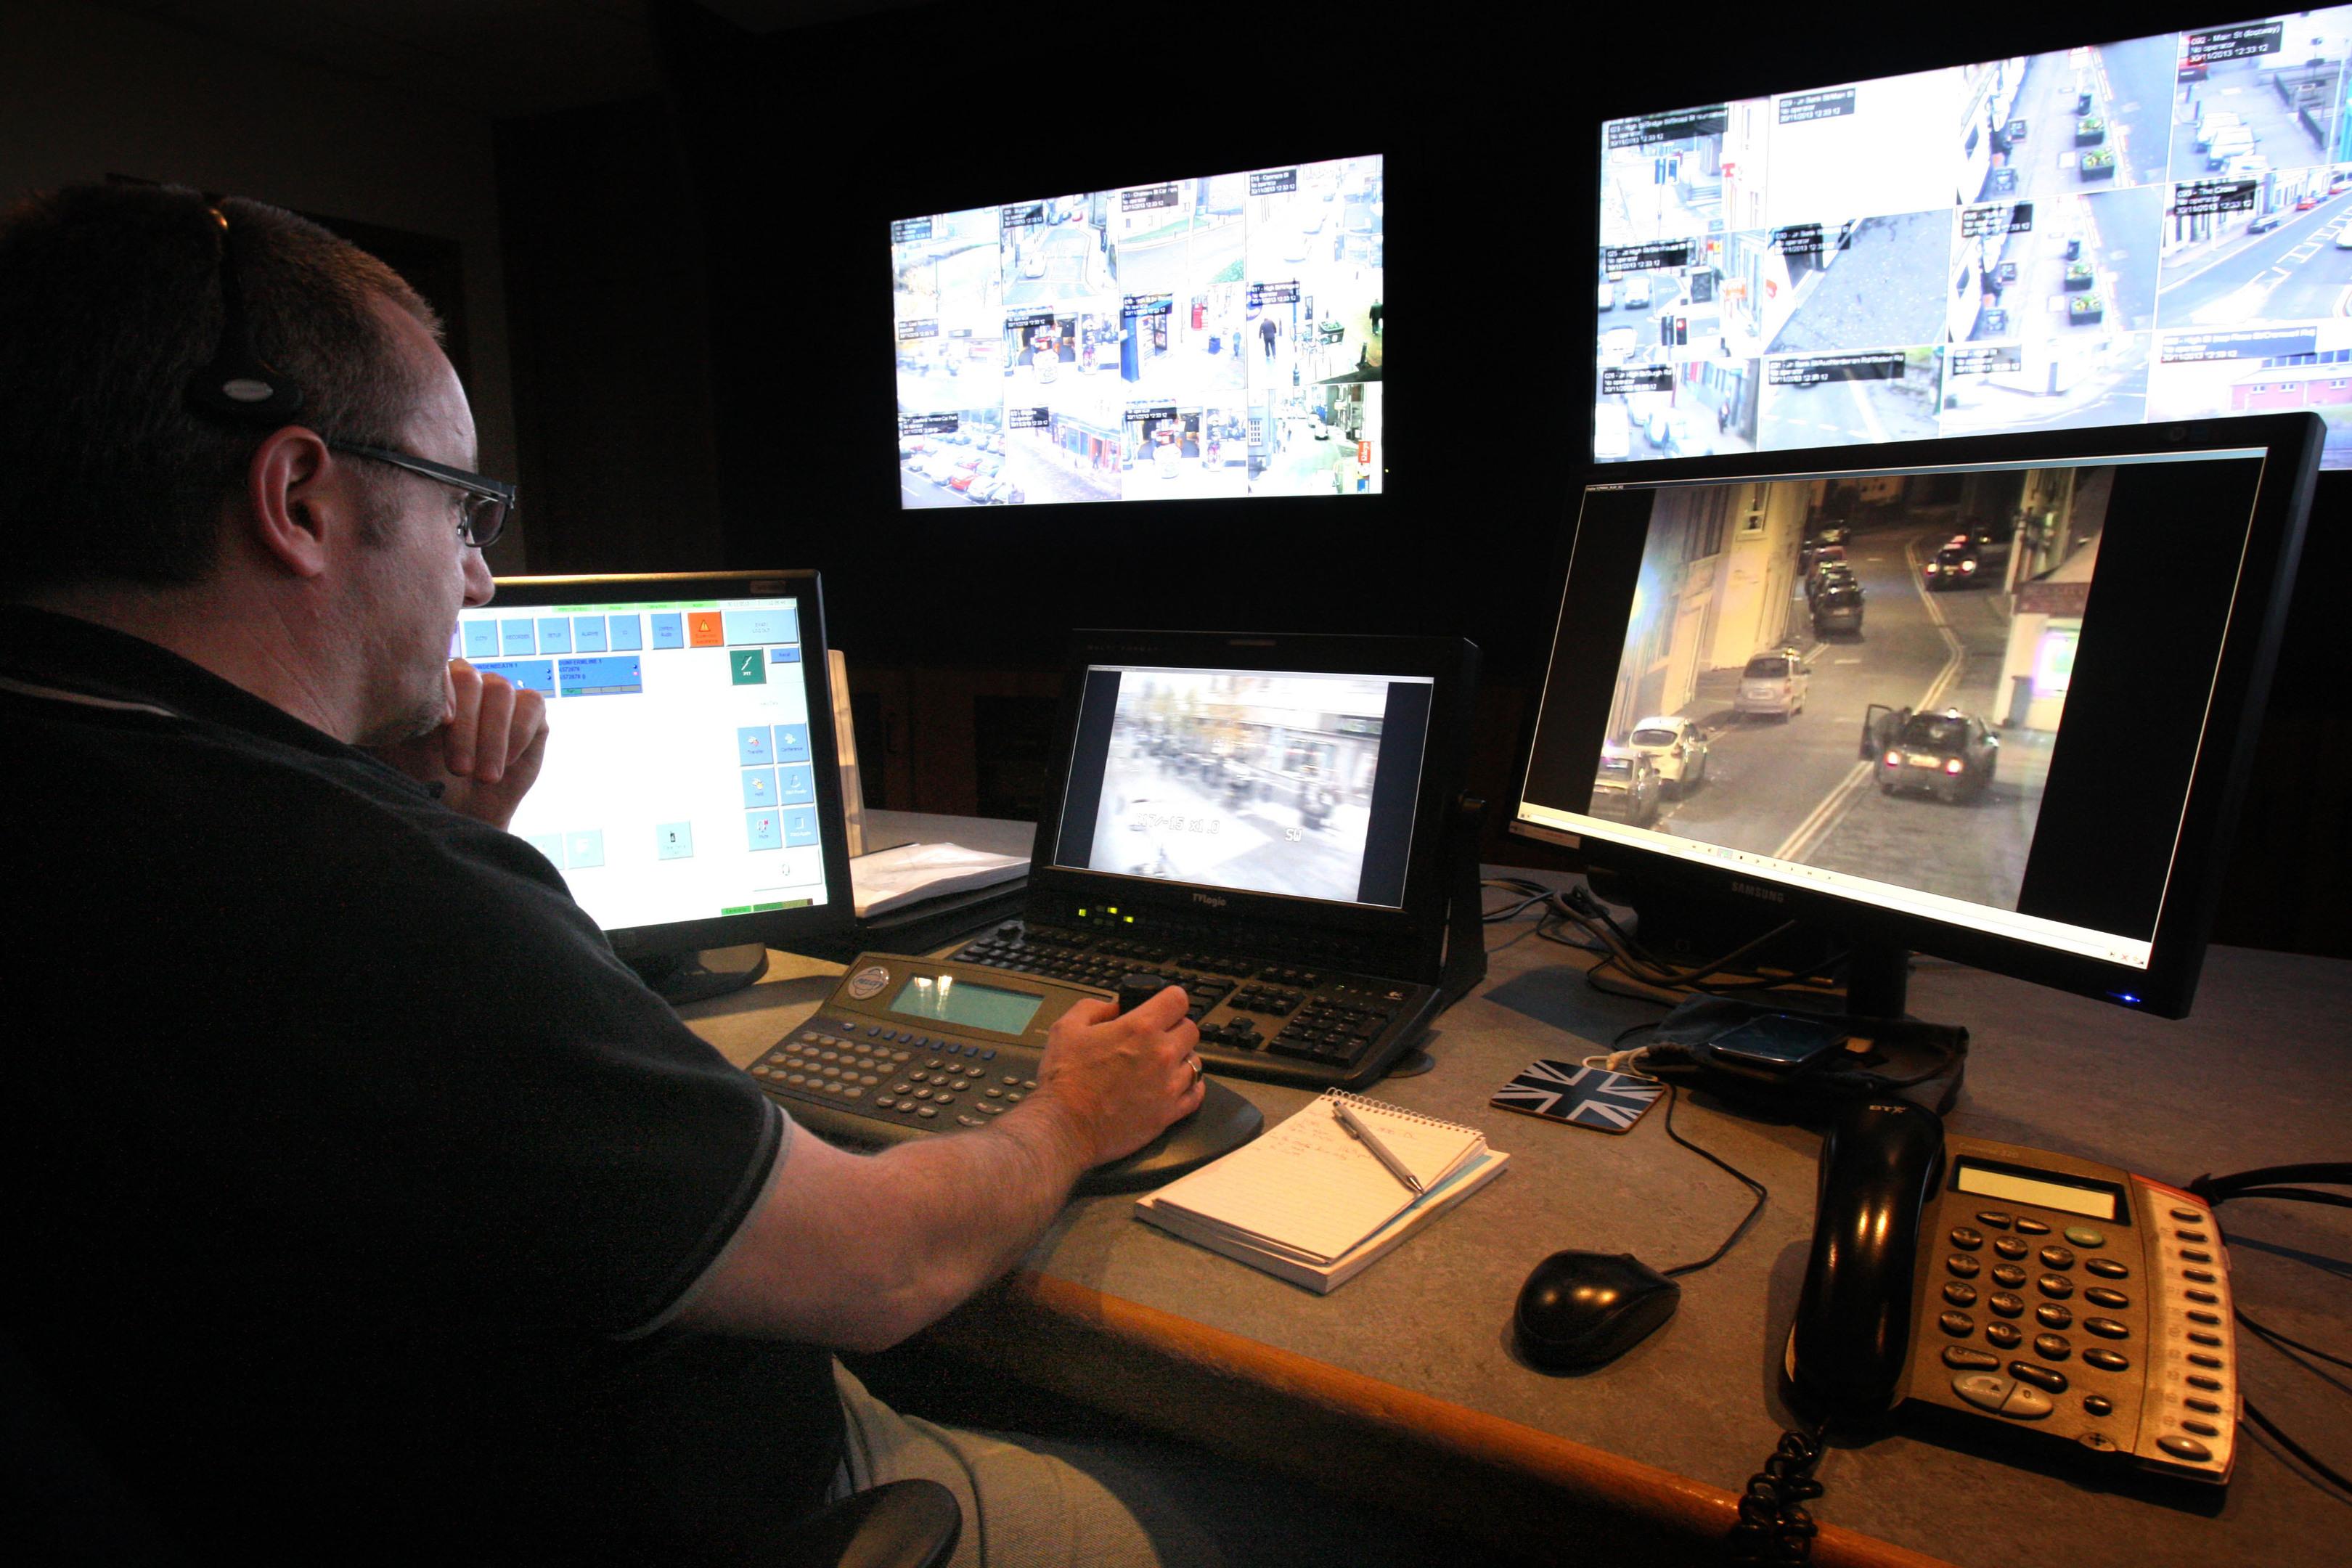 CCTV cameras similar to those planned (Kris Miller / DC Thomson)